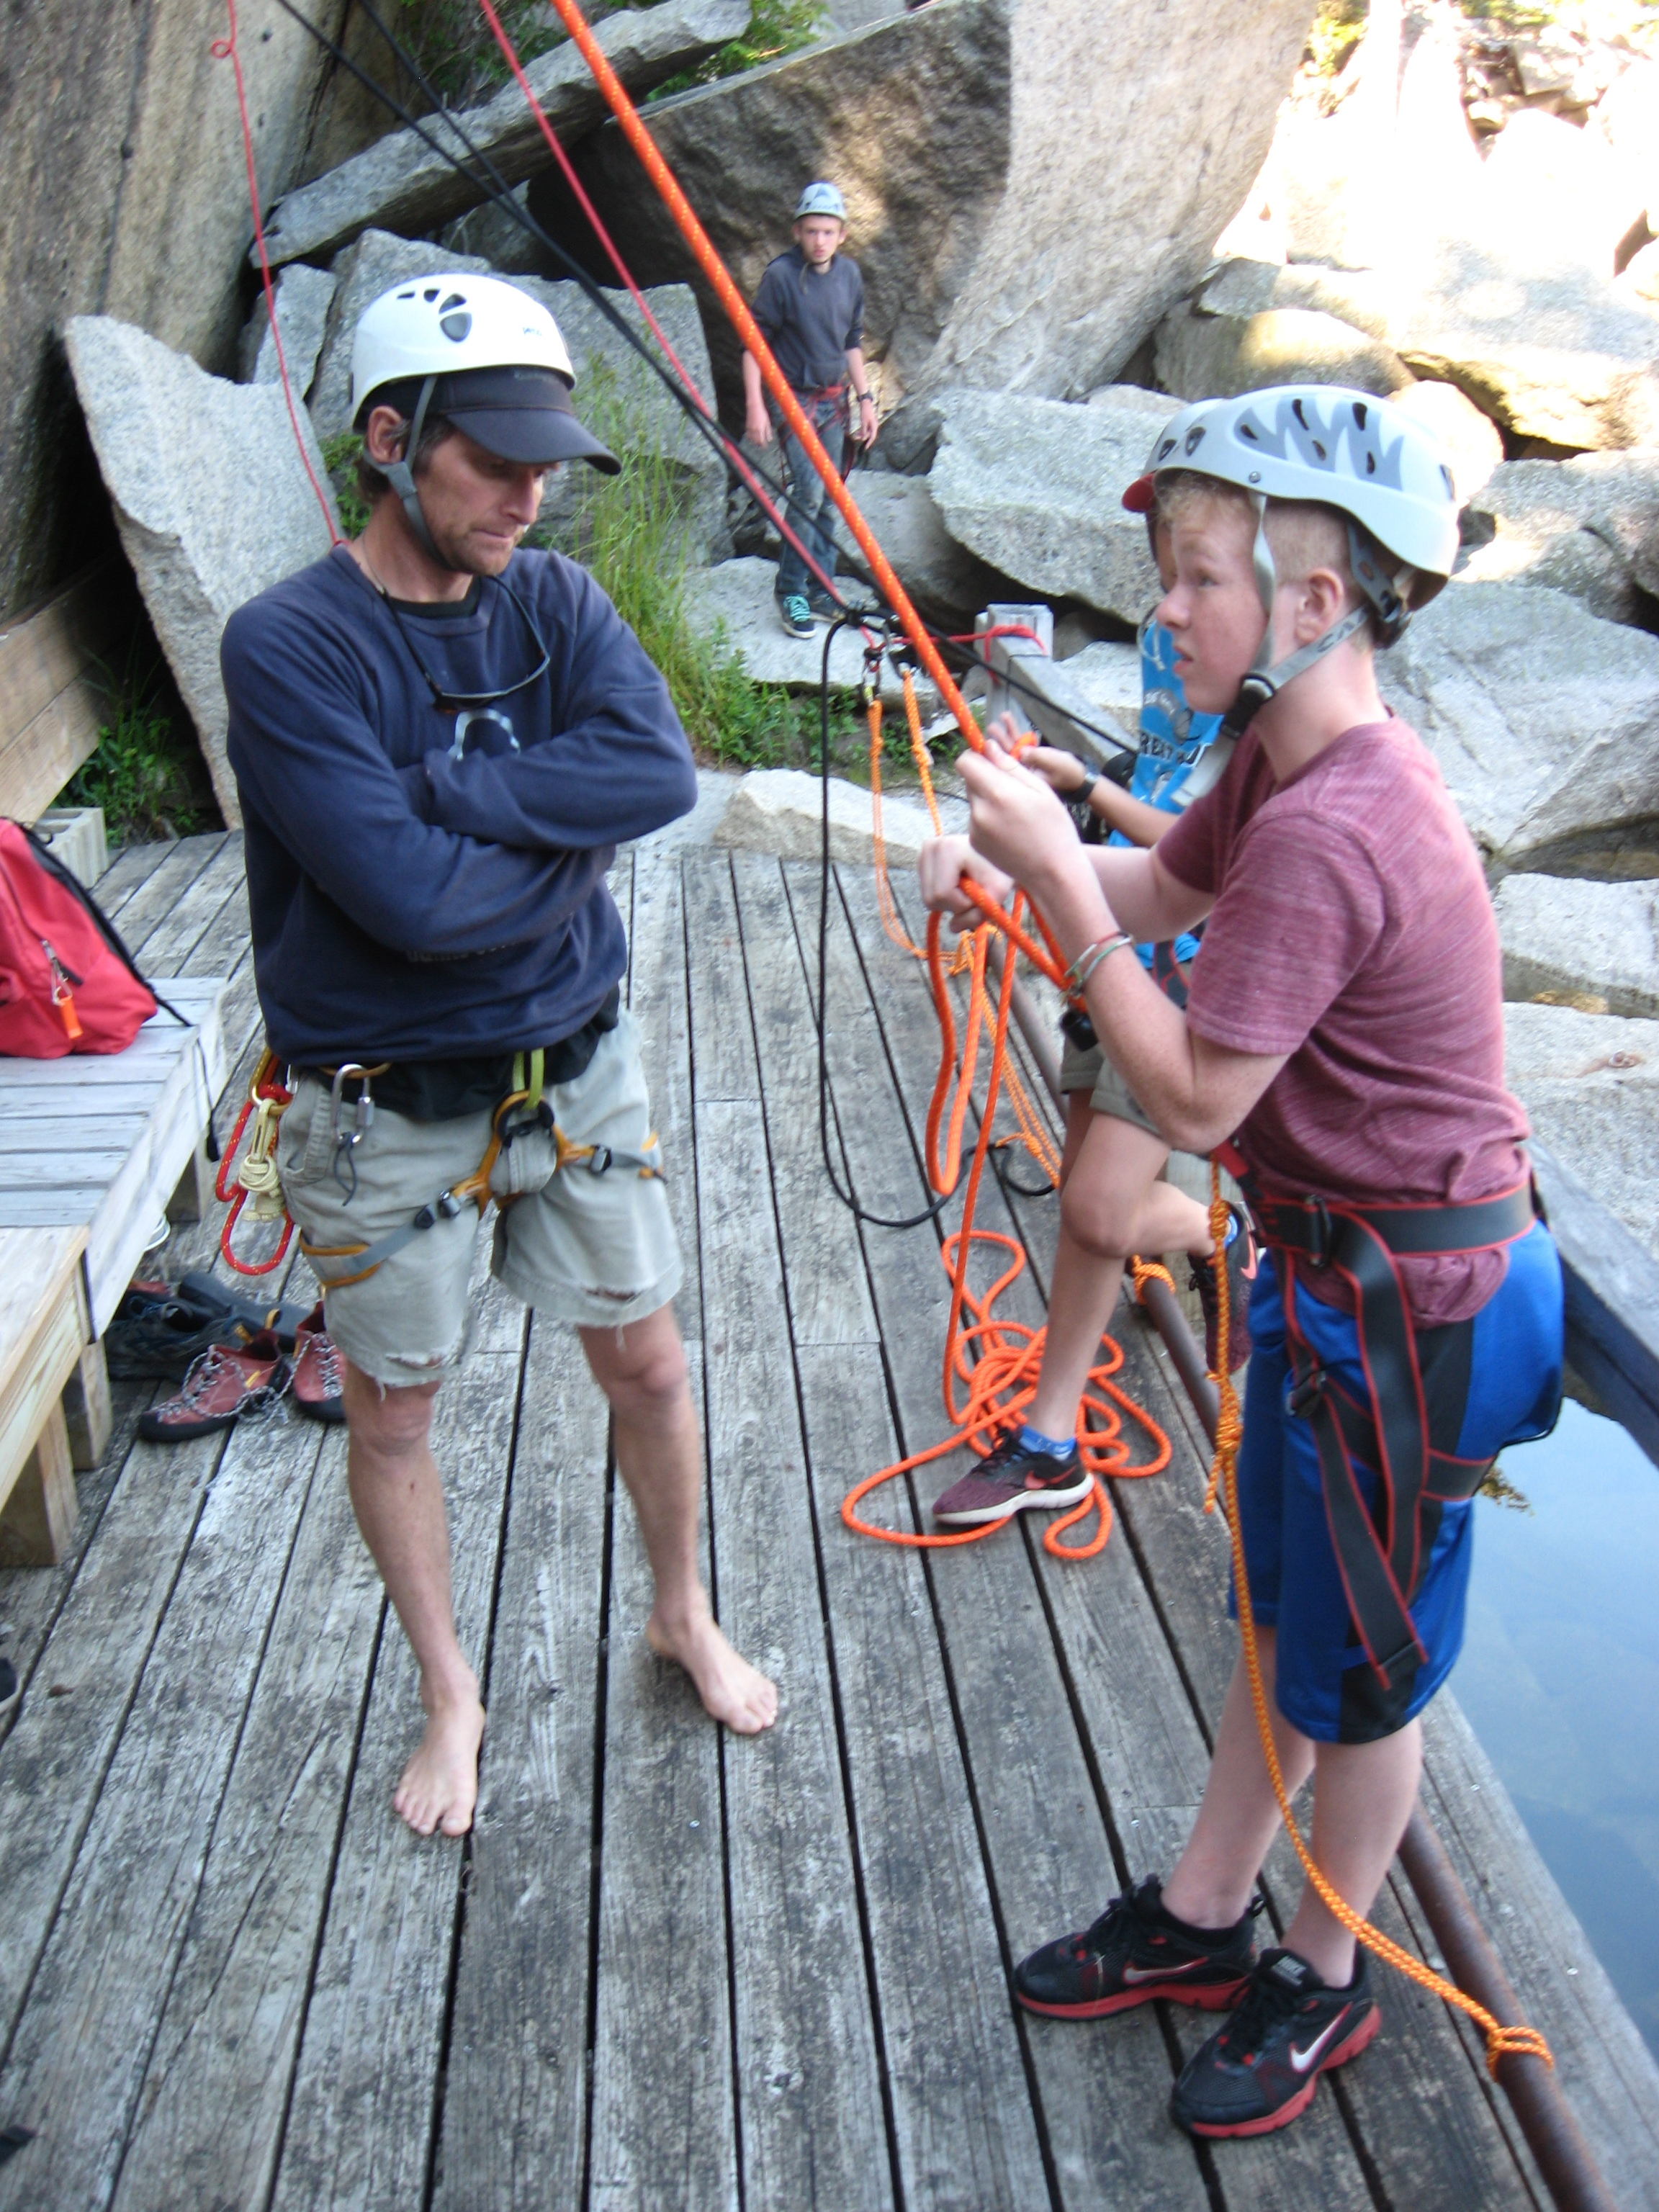 Facilities director and climbing guru Sam Hallowell looks on as the boys rock climb and belay.